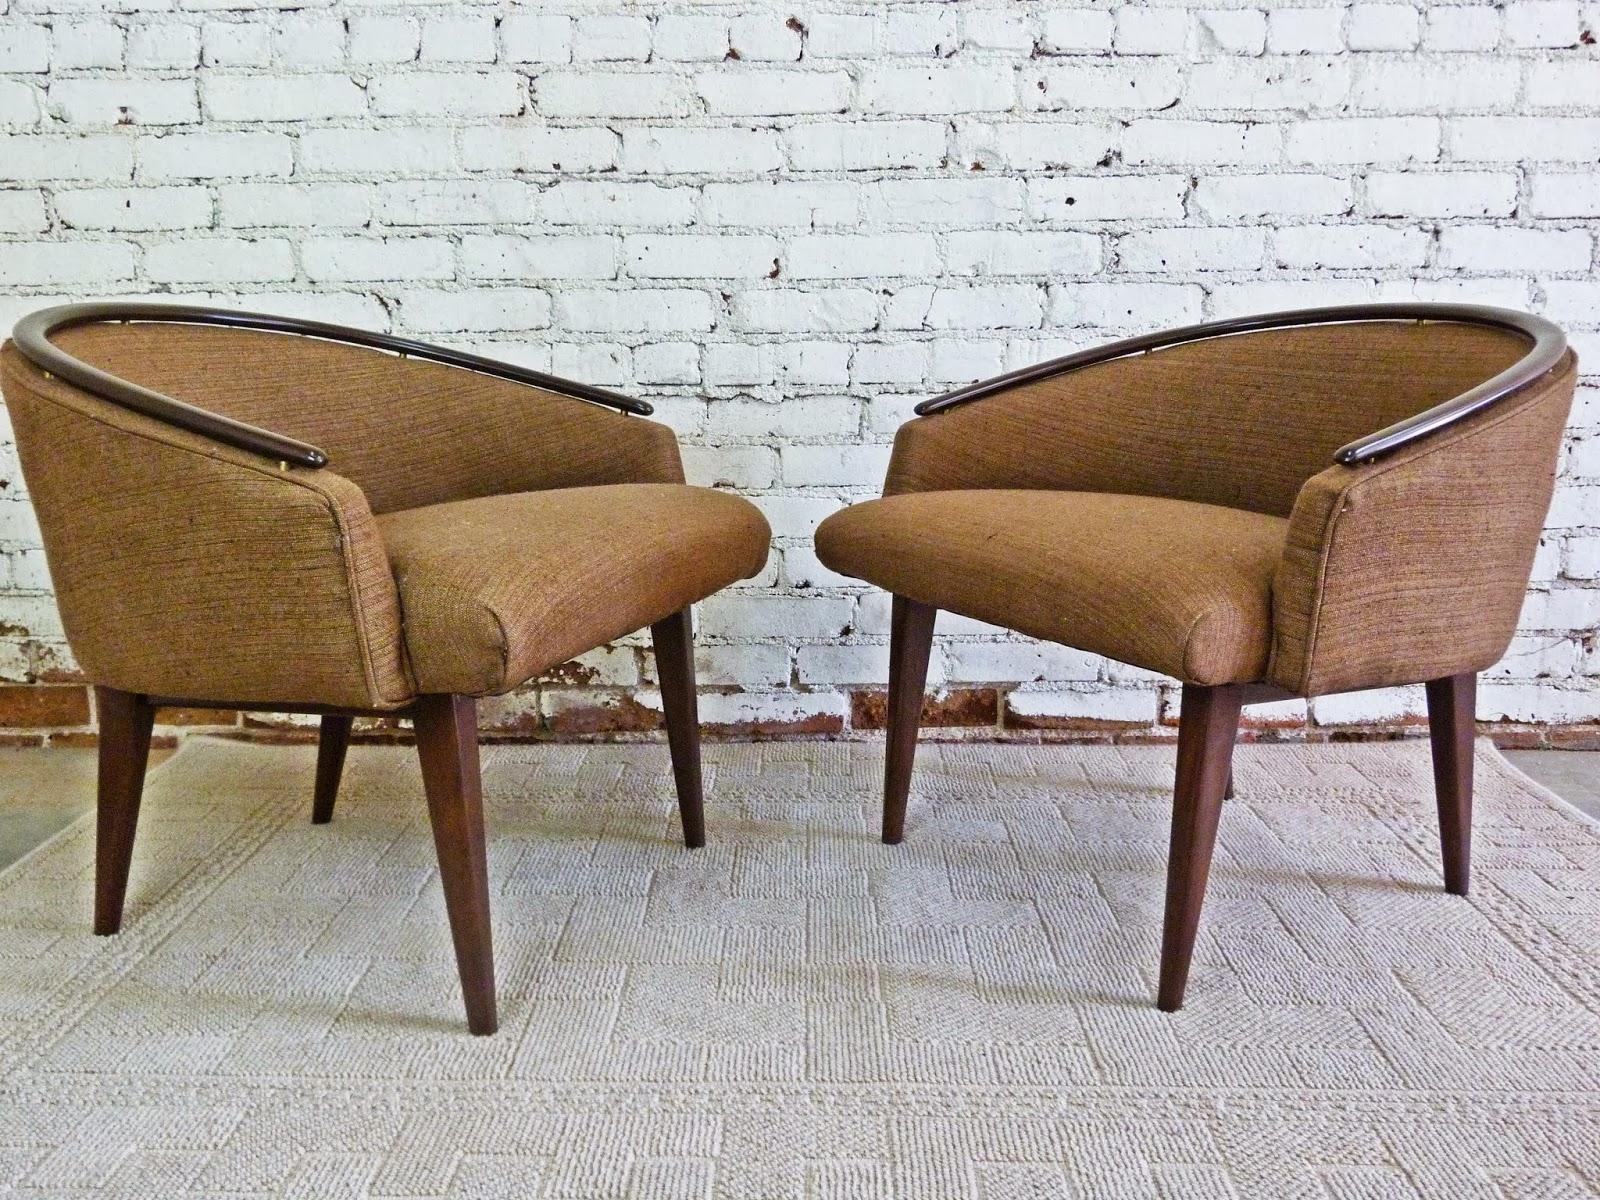 Antiques Modern Mid Century Danish Vintage Retro and